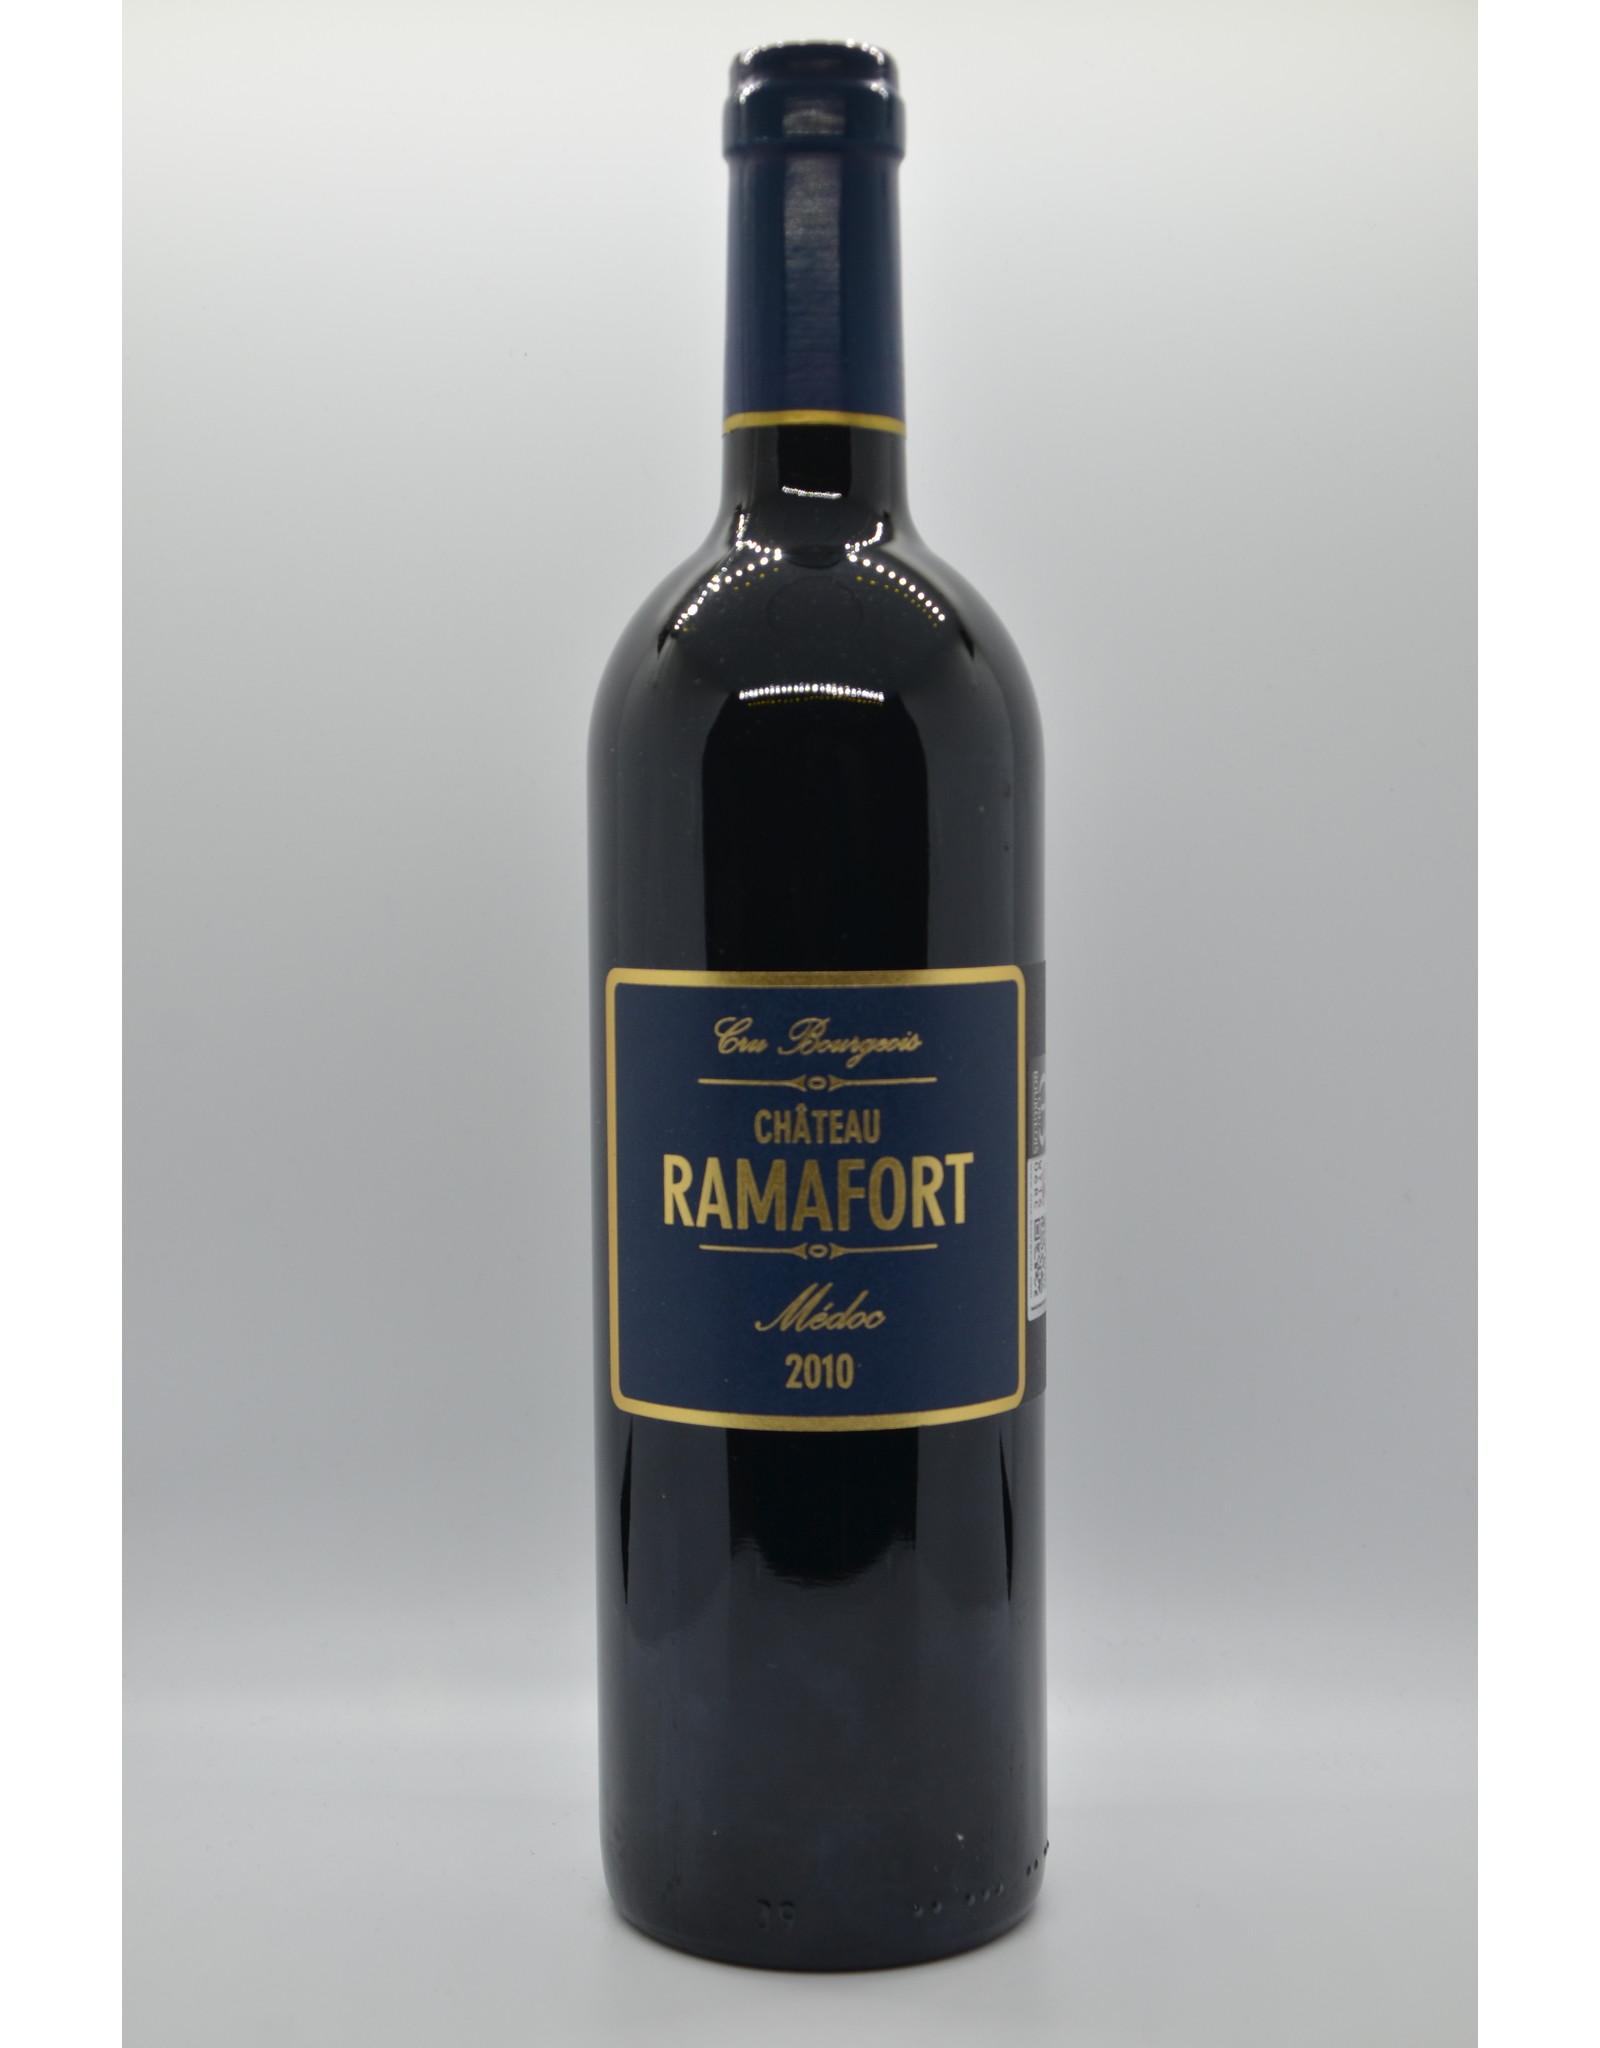 France Ch. Ramafort Medoc